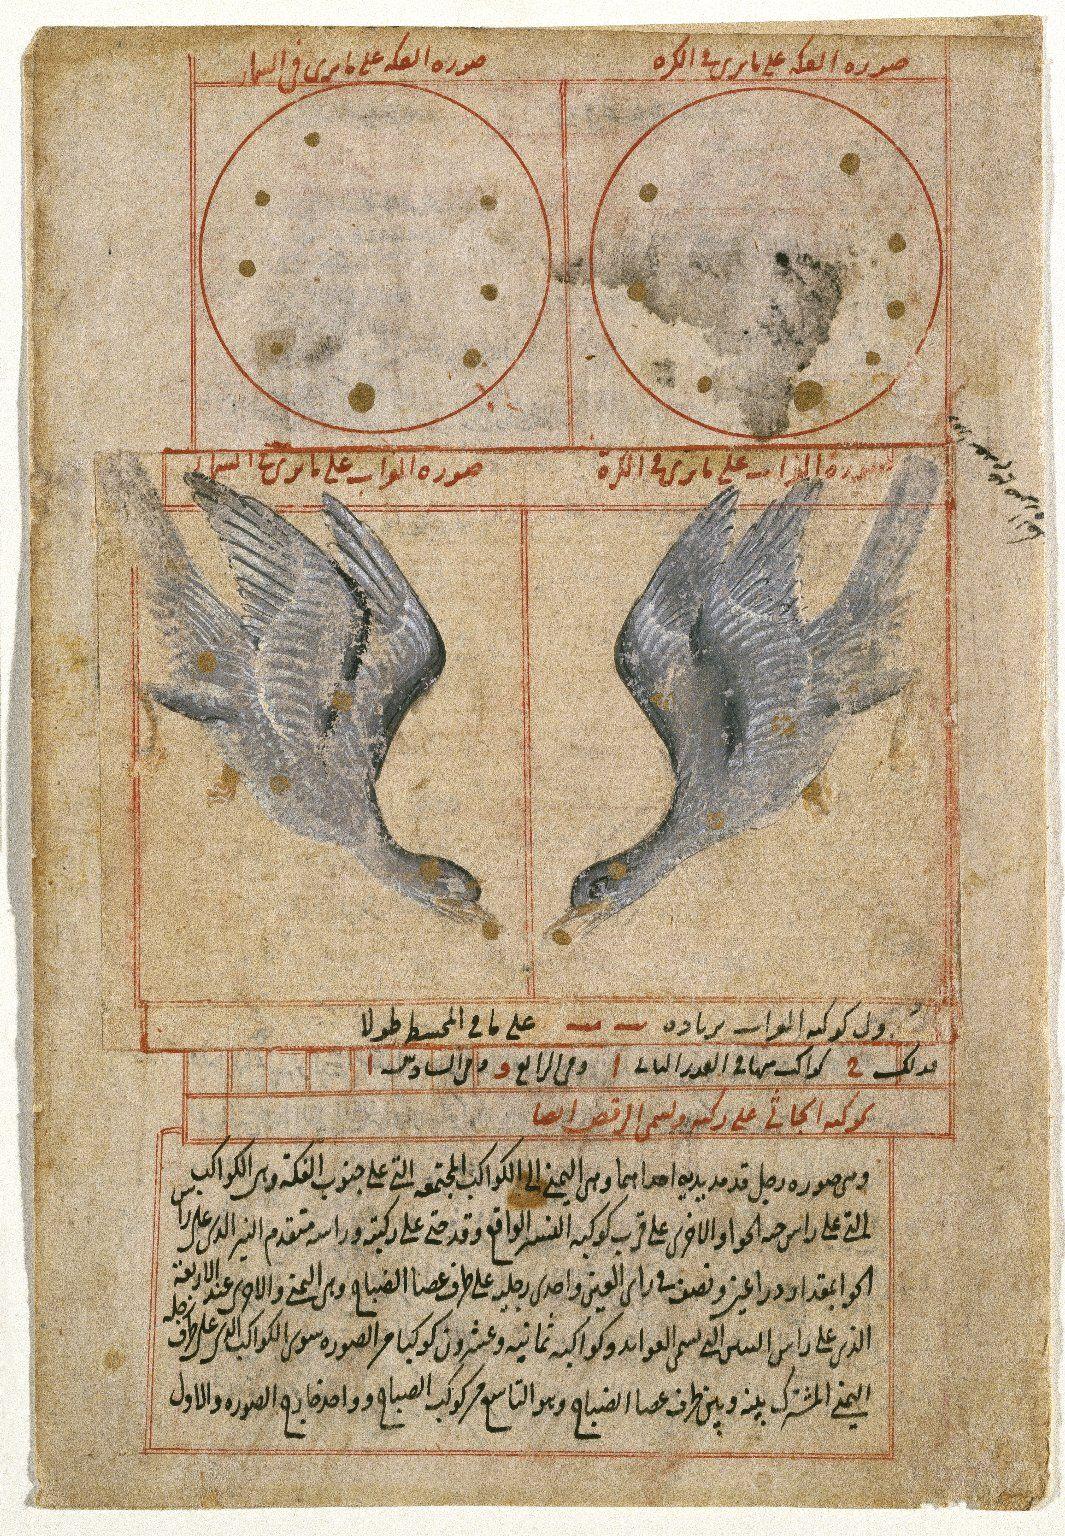 The_Constellation_of_Corvus_the_Raven.jpg 1.065×1.536 pixels